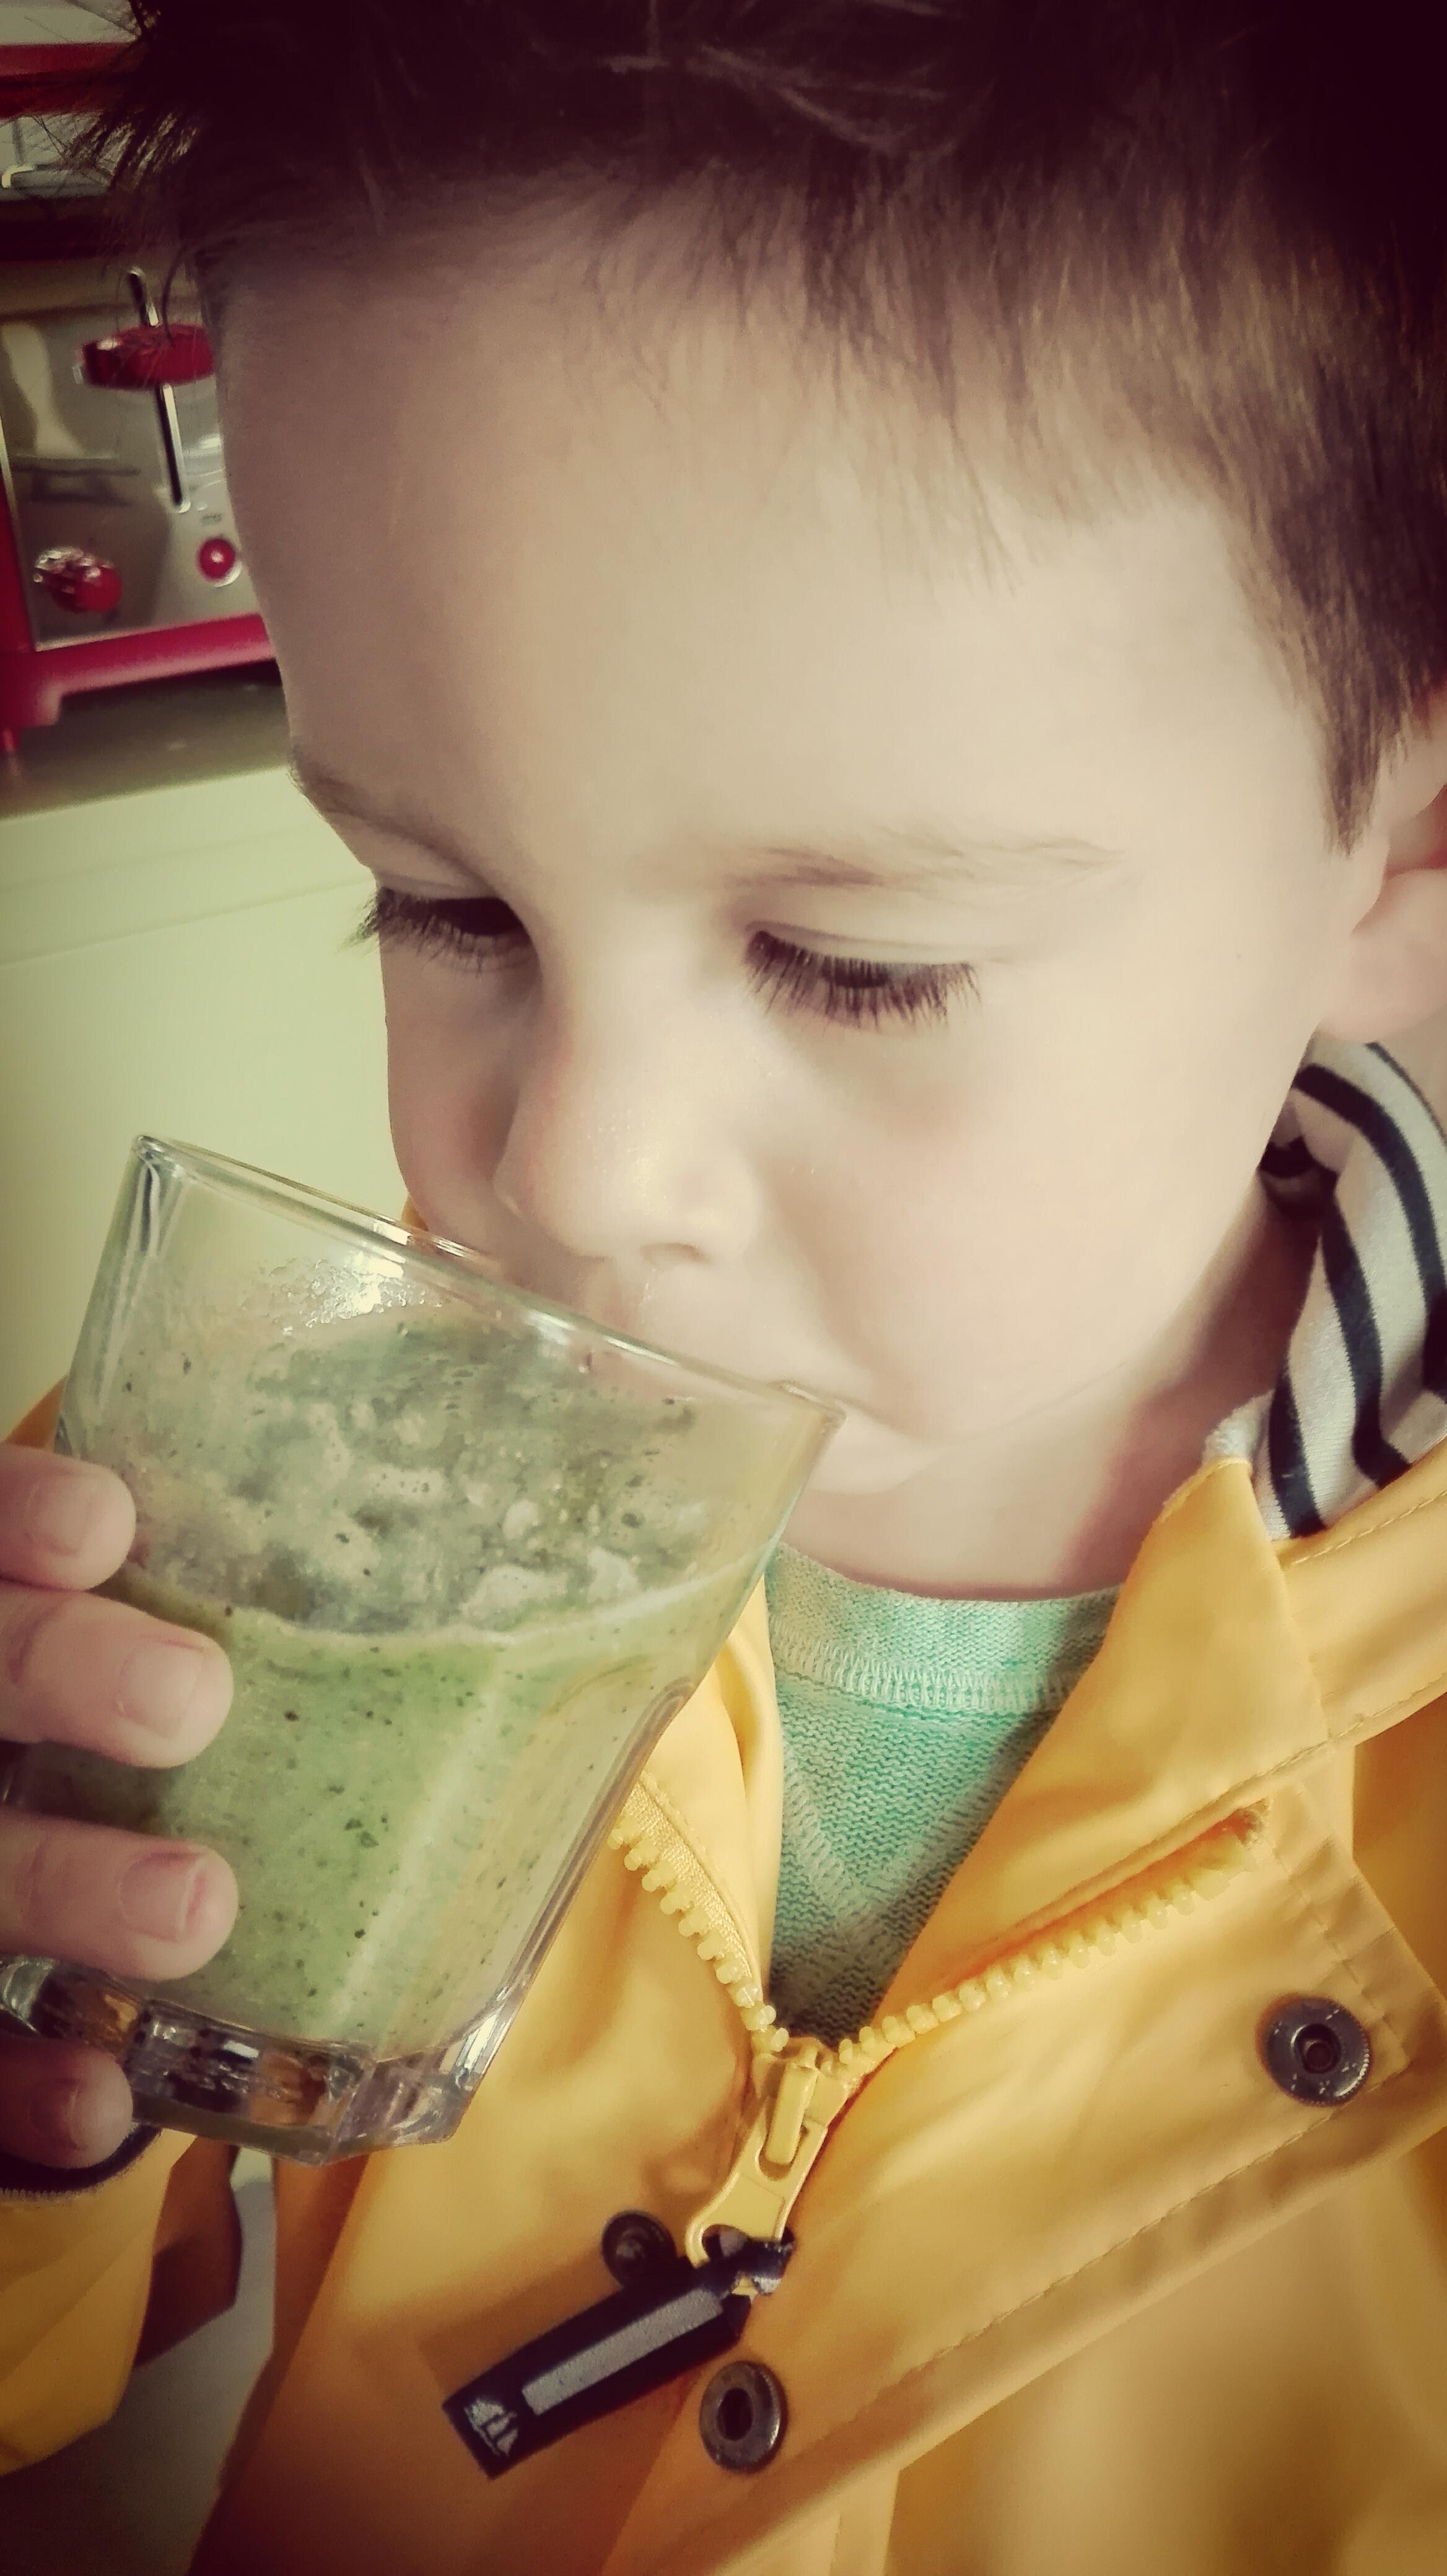 Smoothie - groene - fruit - groente - lekker - slim - dreumes - peuter - kleuter - nanny annelon - recept2